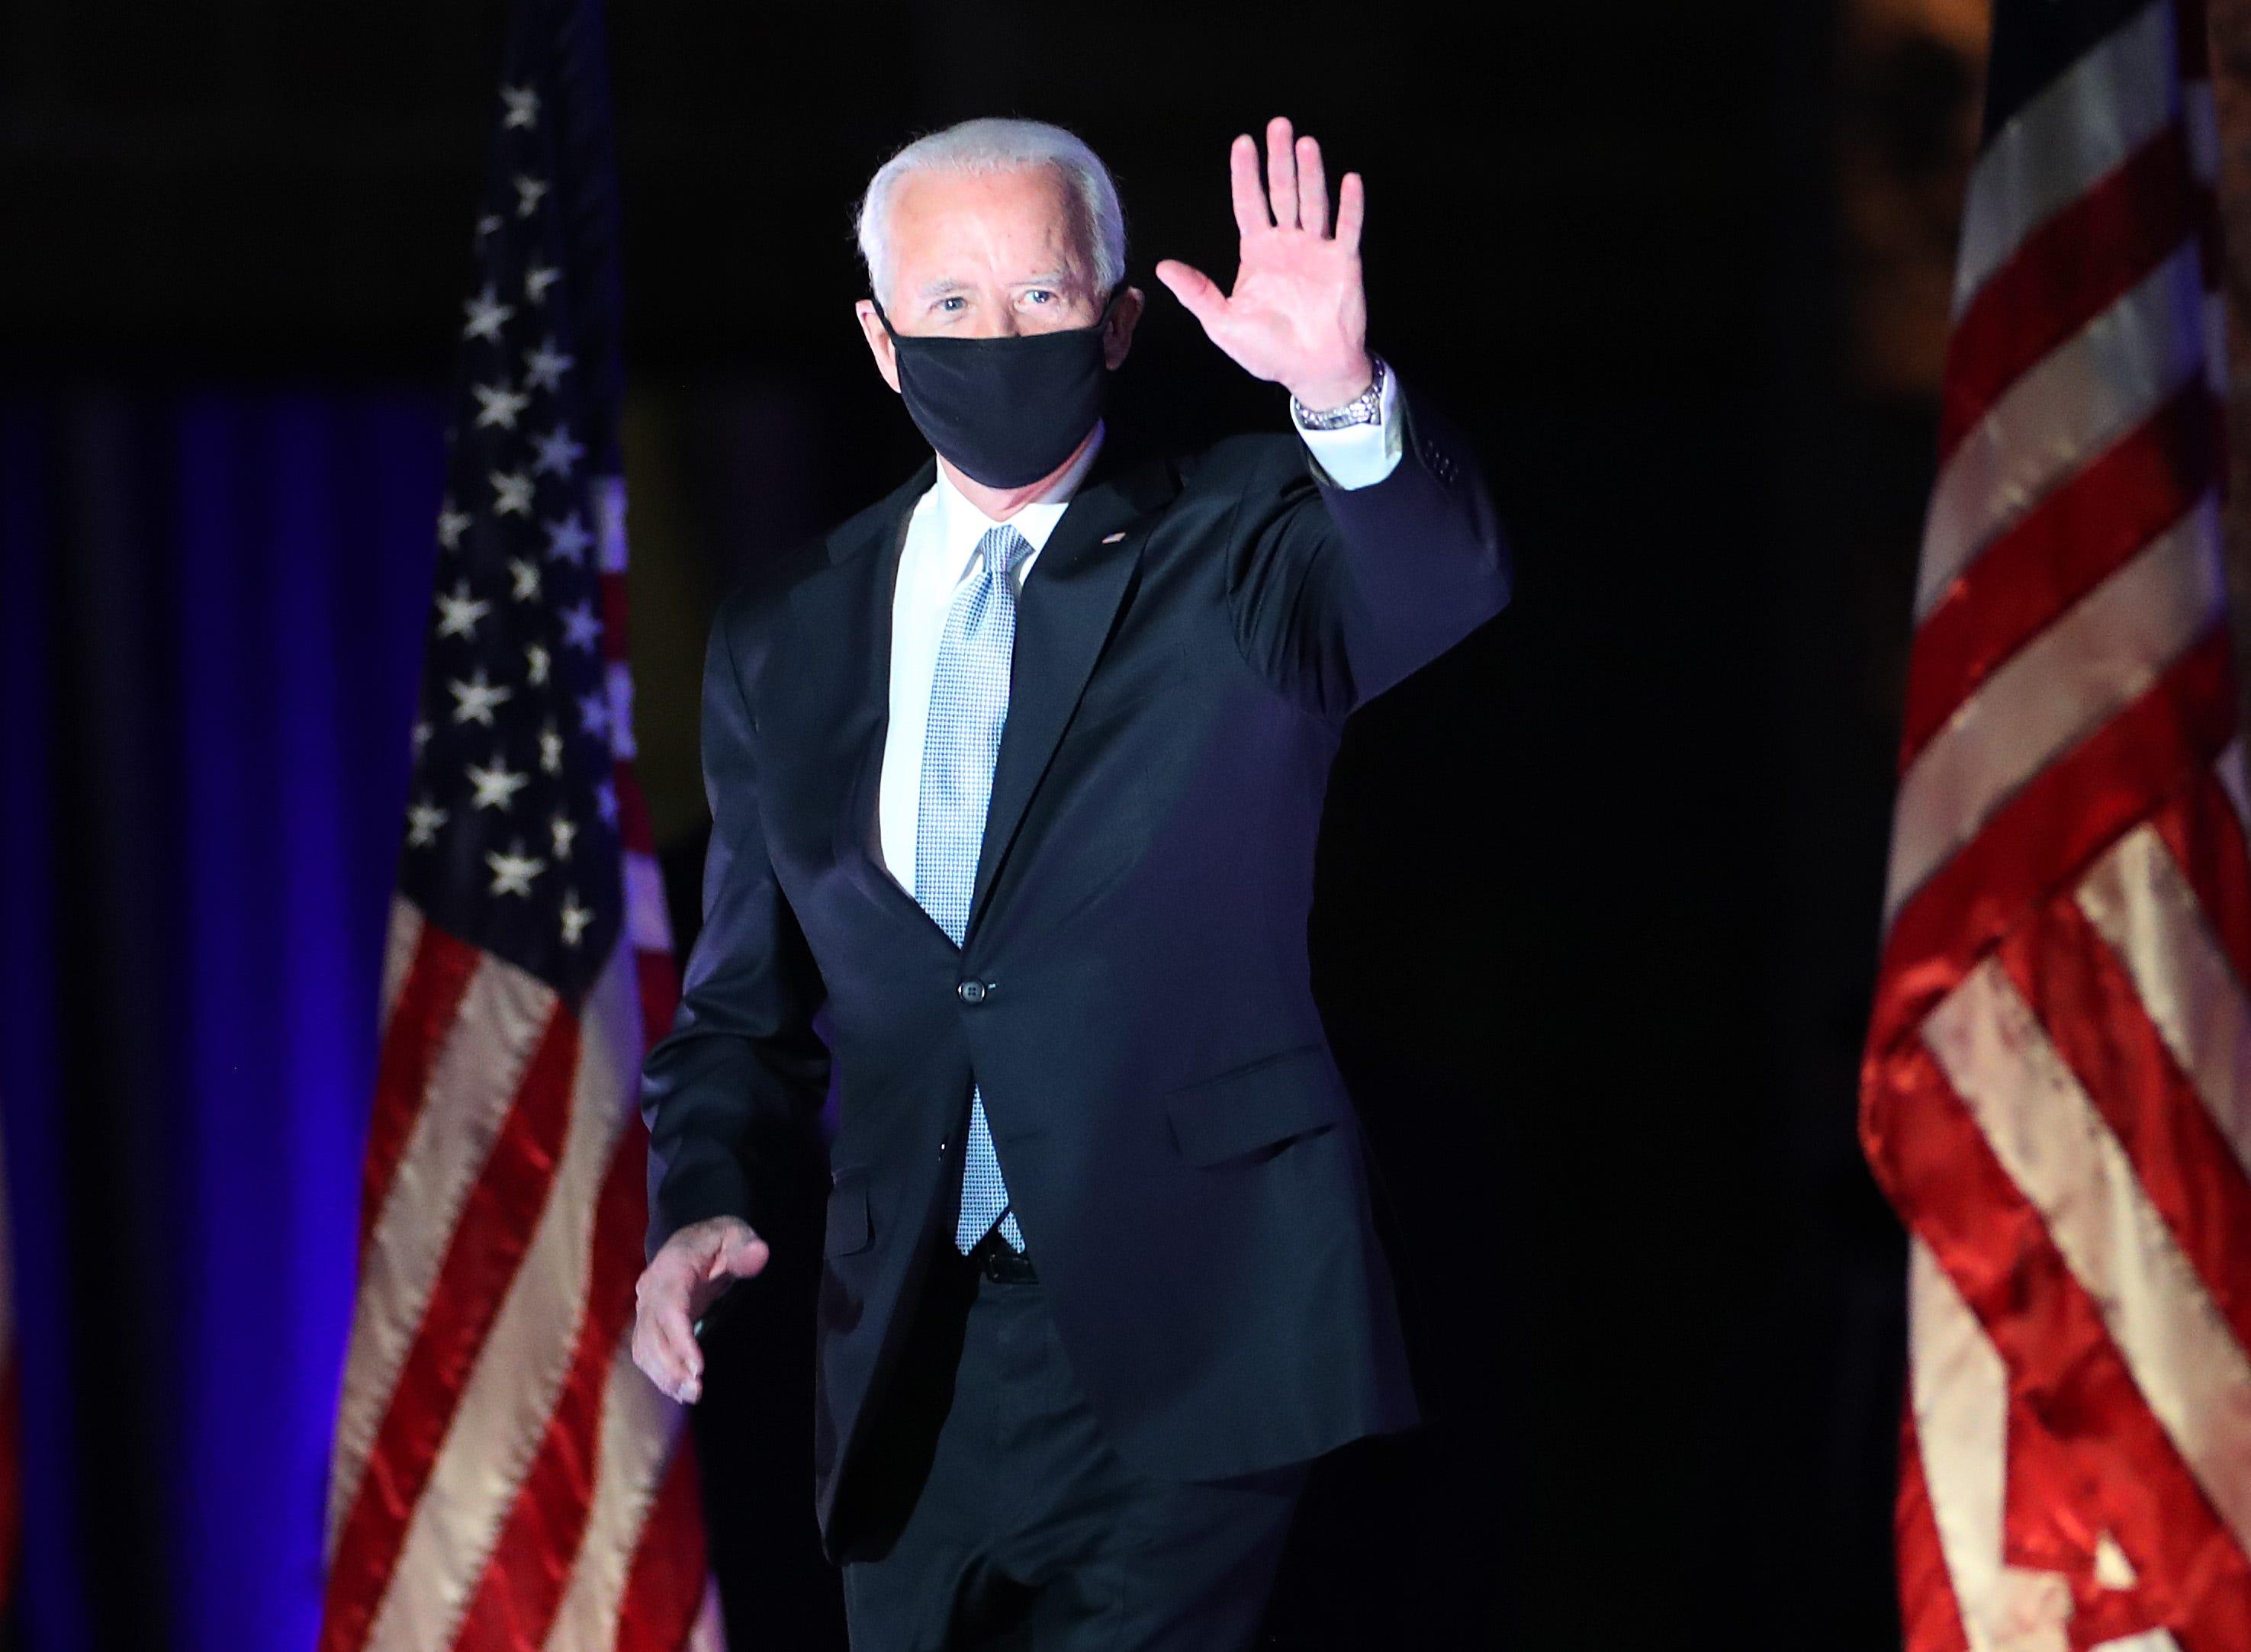 Election results updates: Joe Biden, Kamala Harris speak to nation after election win